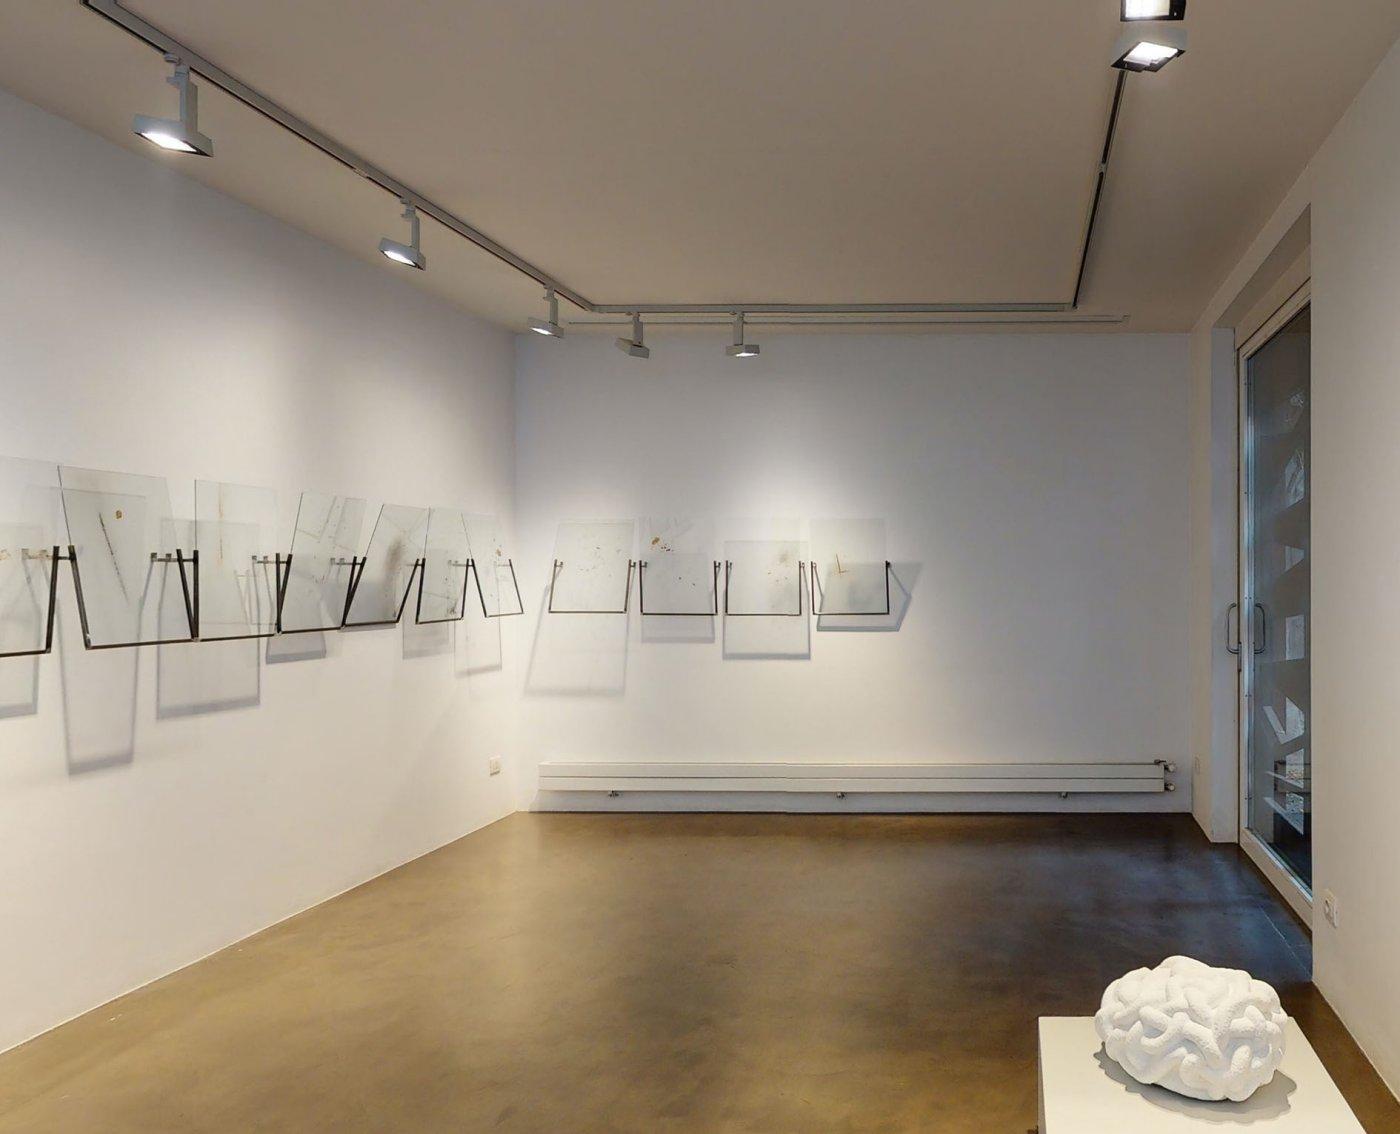 Galleria Anna Marra Viewing Room 1 4